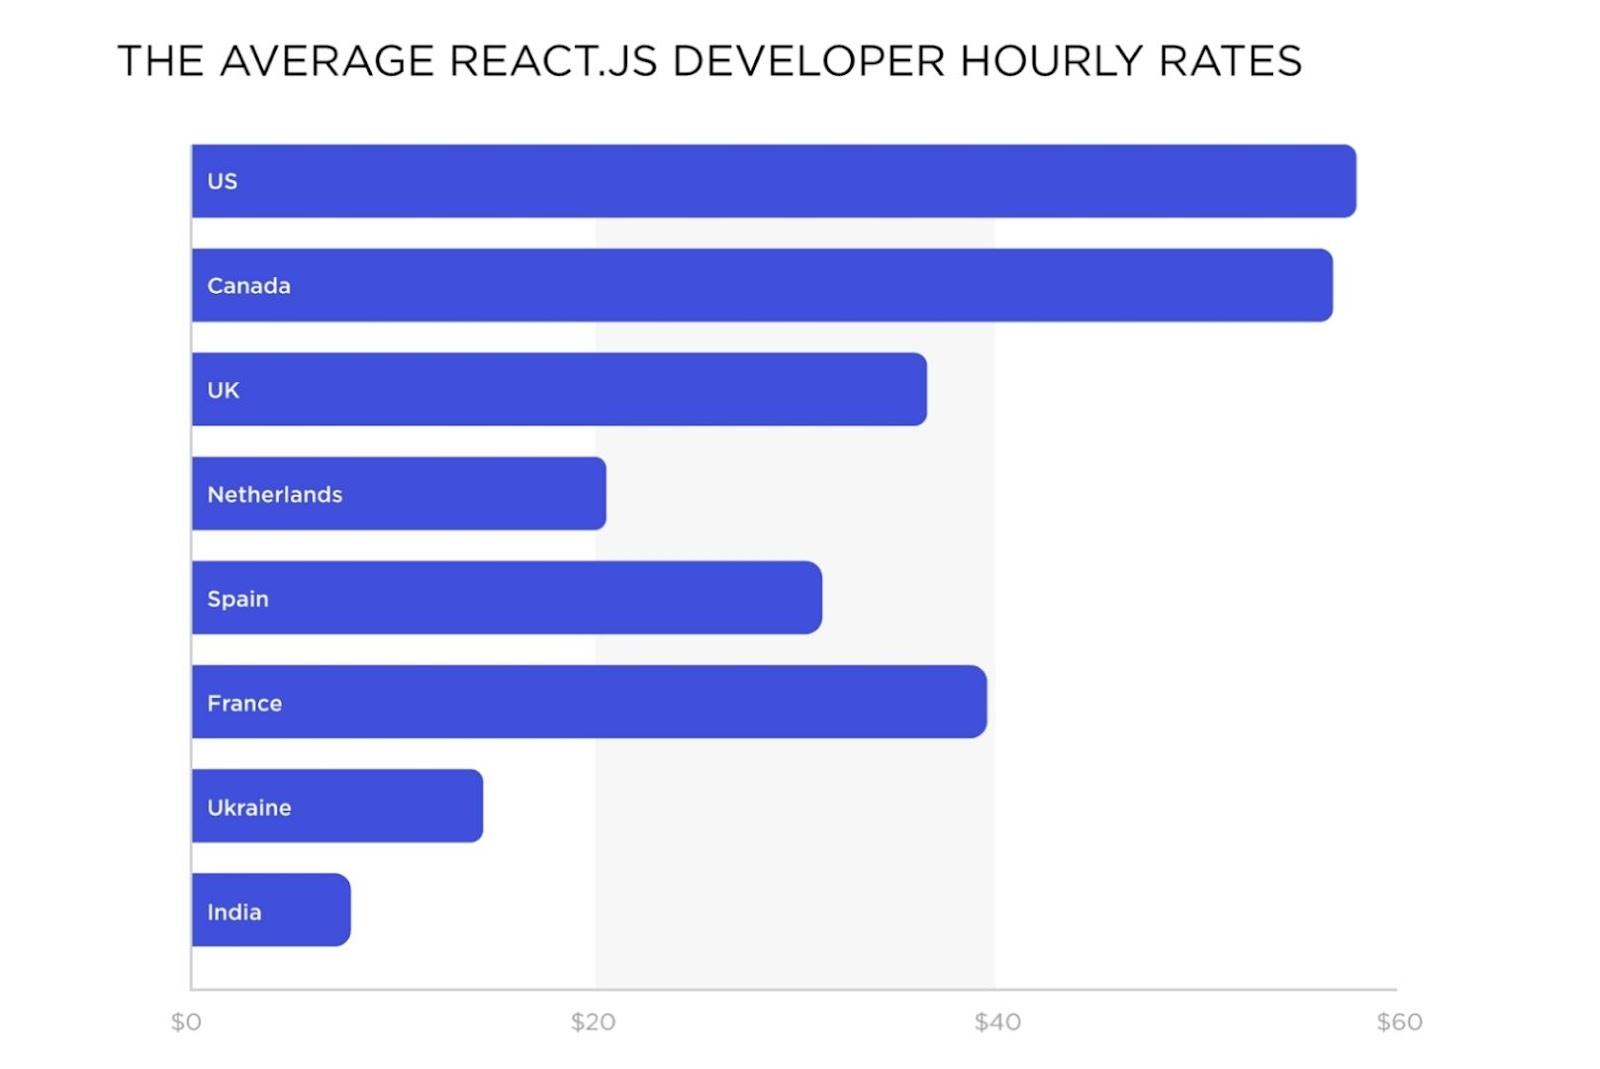 Cost to hire reactjs developer